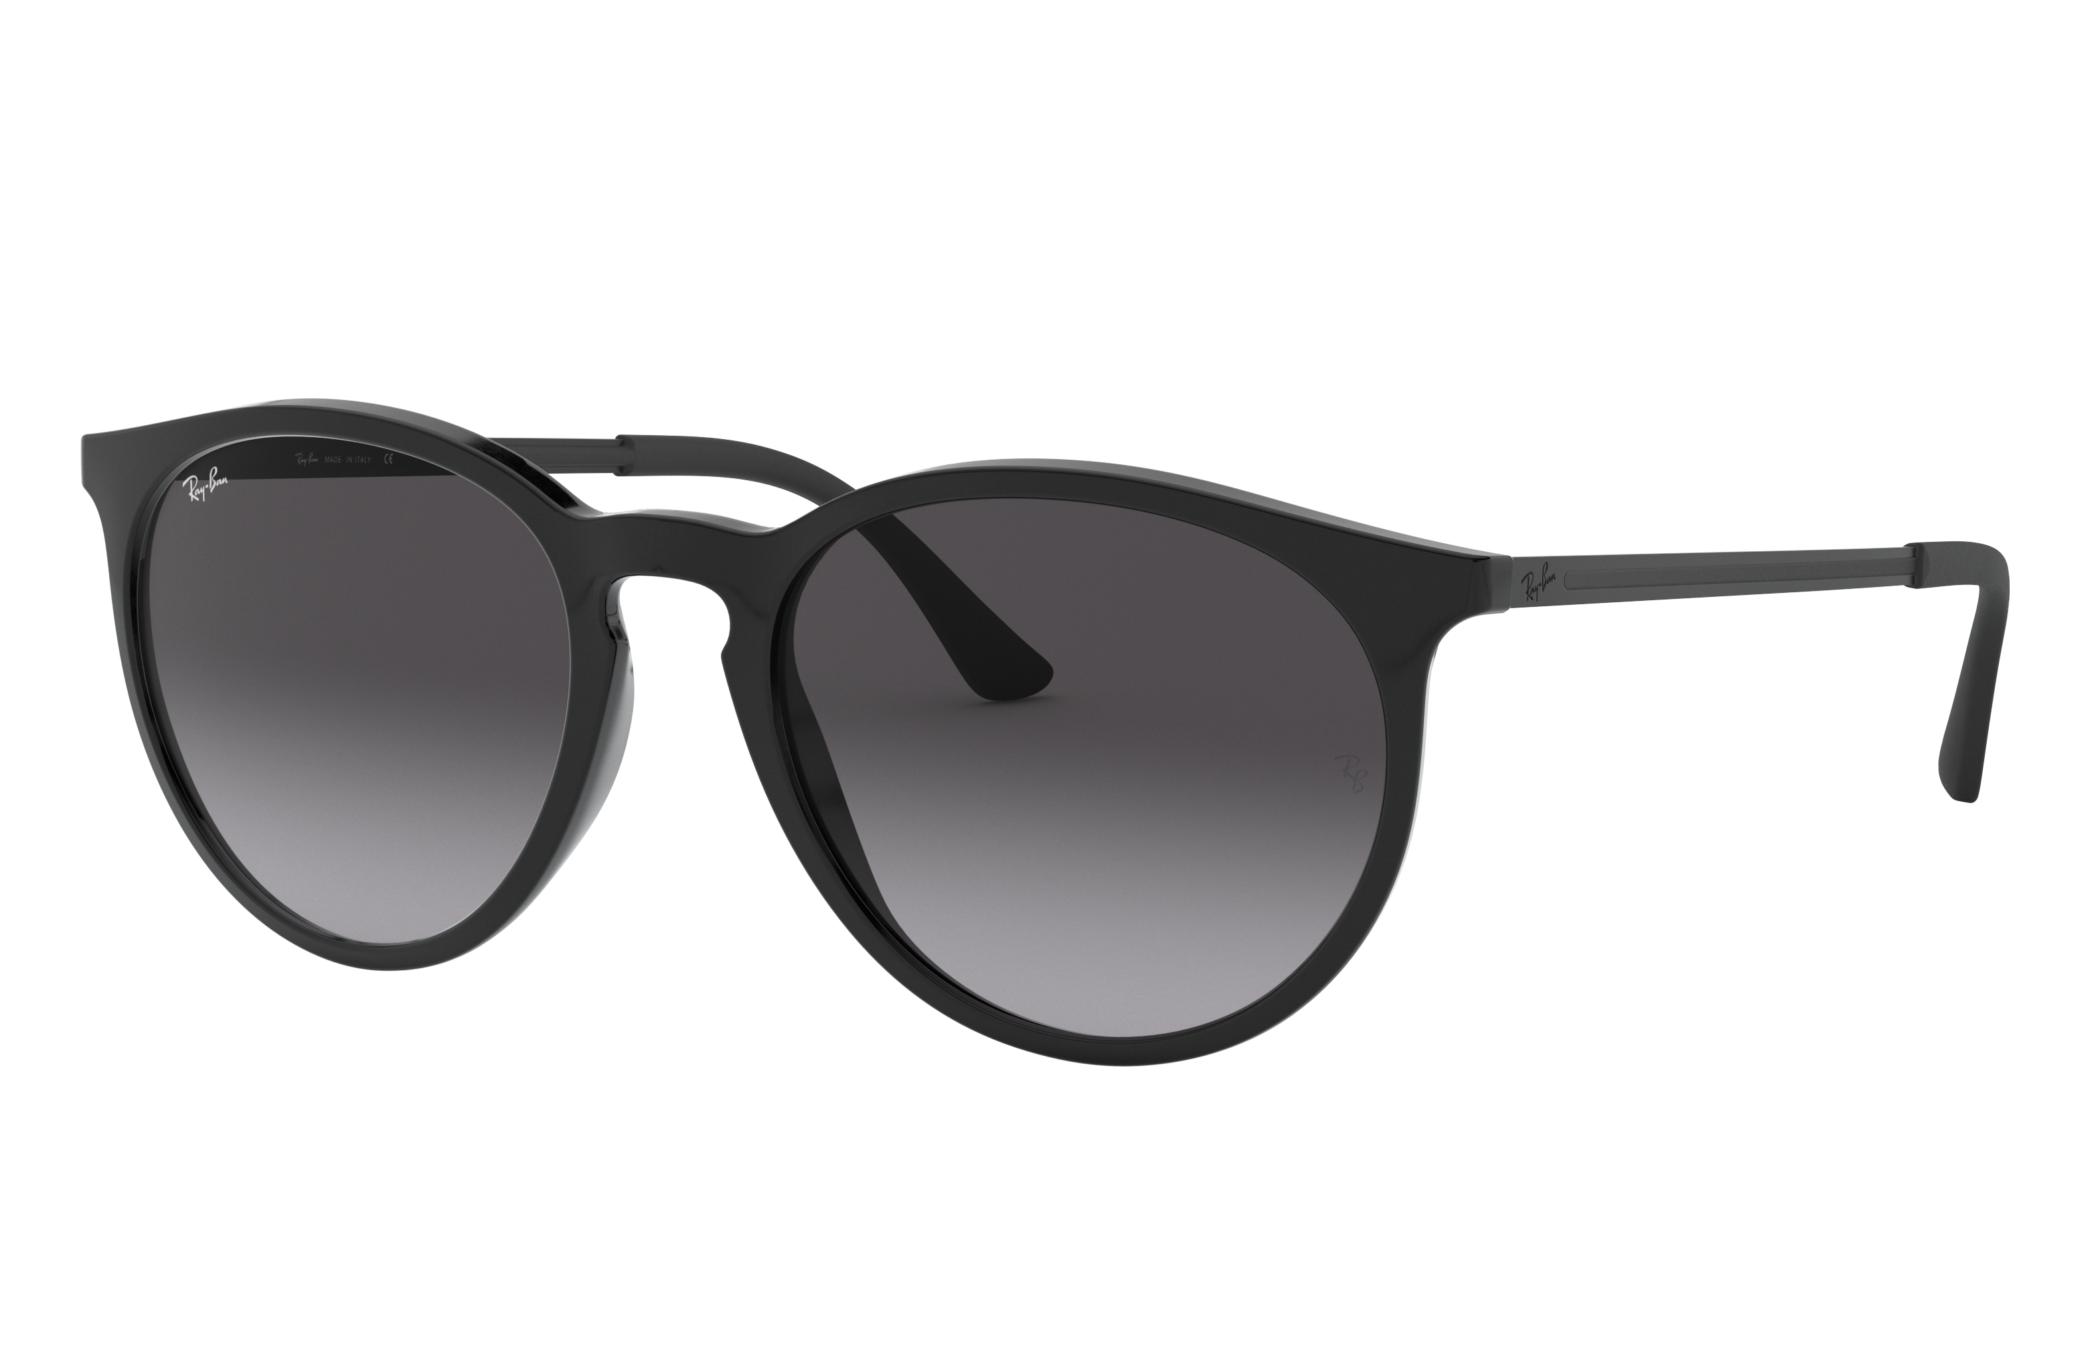 Ray-Ban Rb4274 Black, Gray Lenses - RB4274